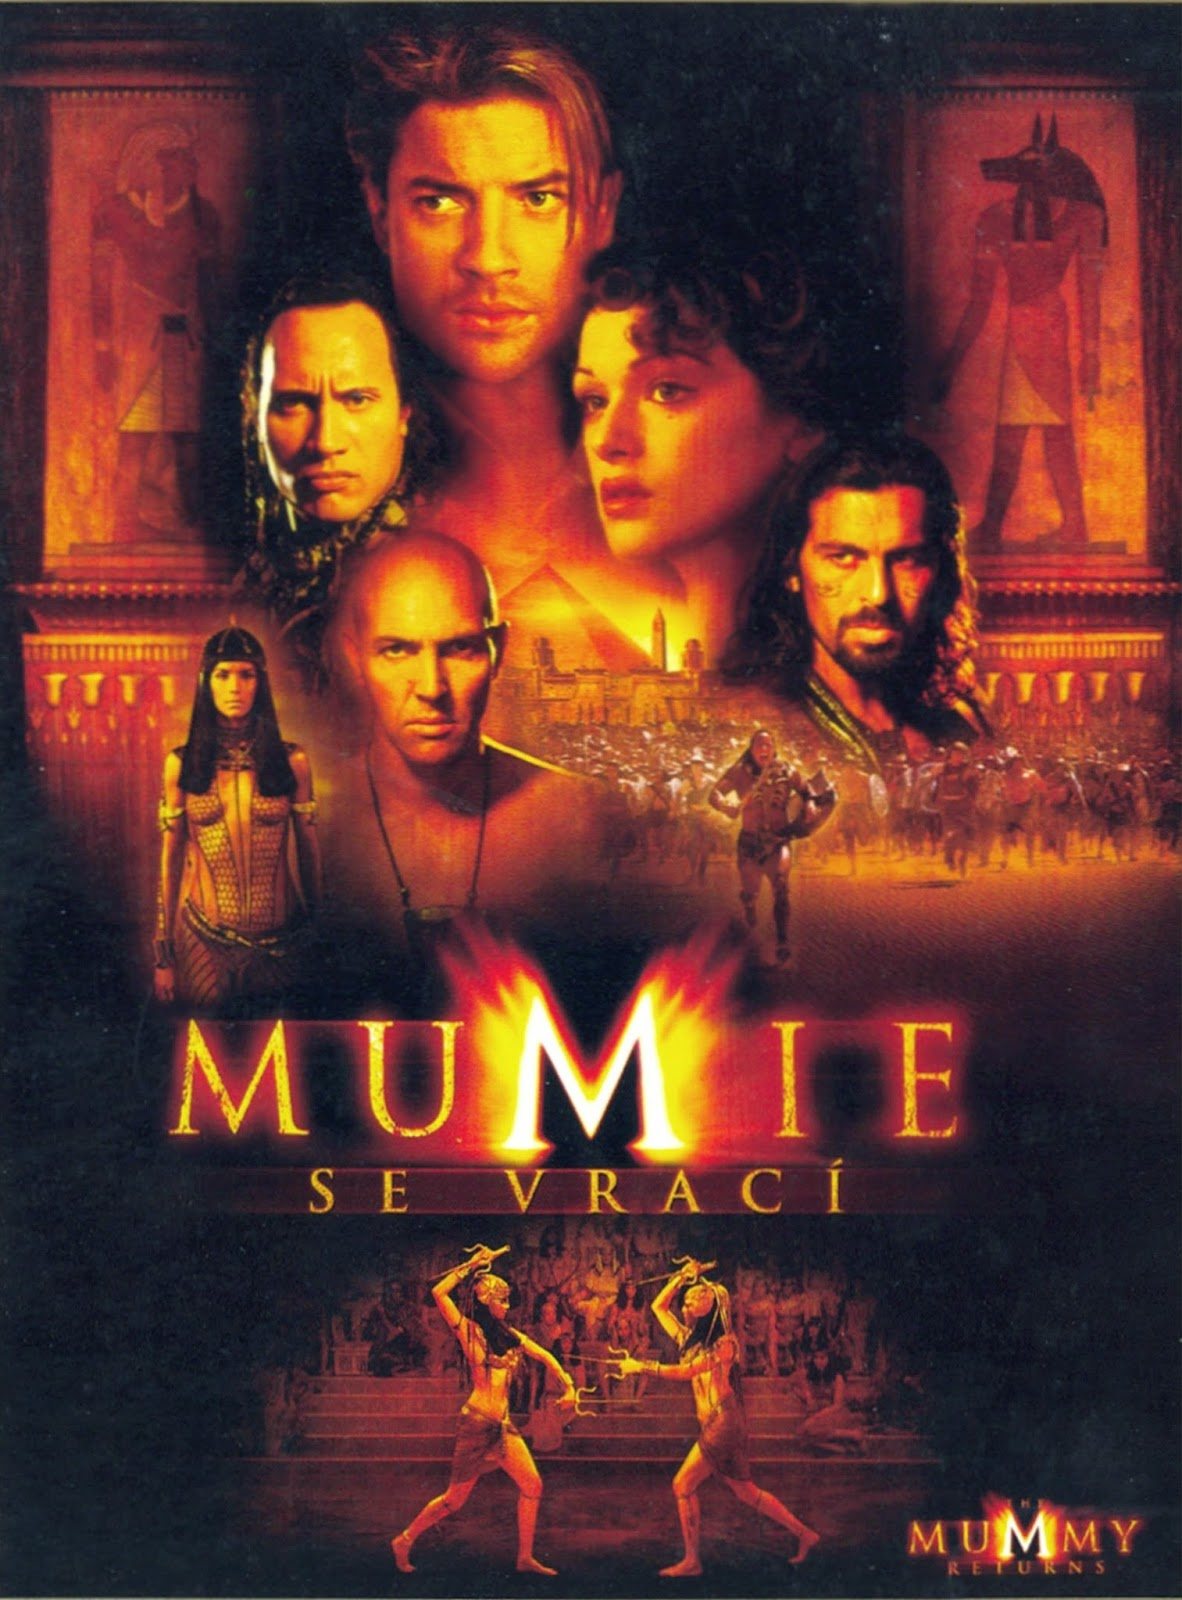 The Mummy Returns 2001